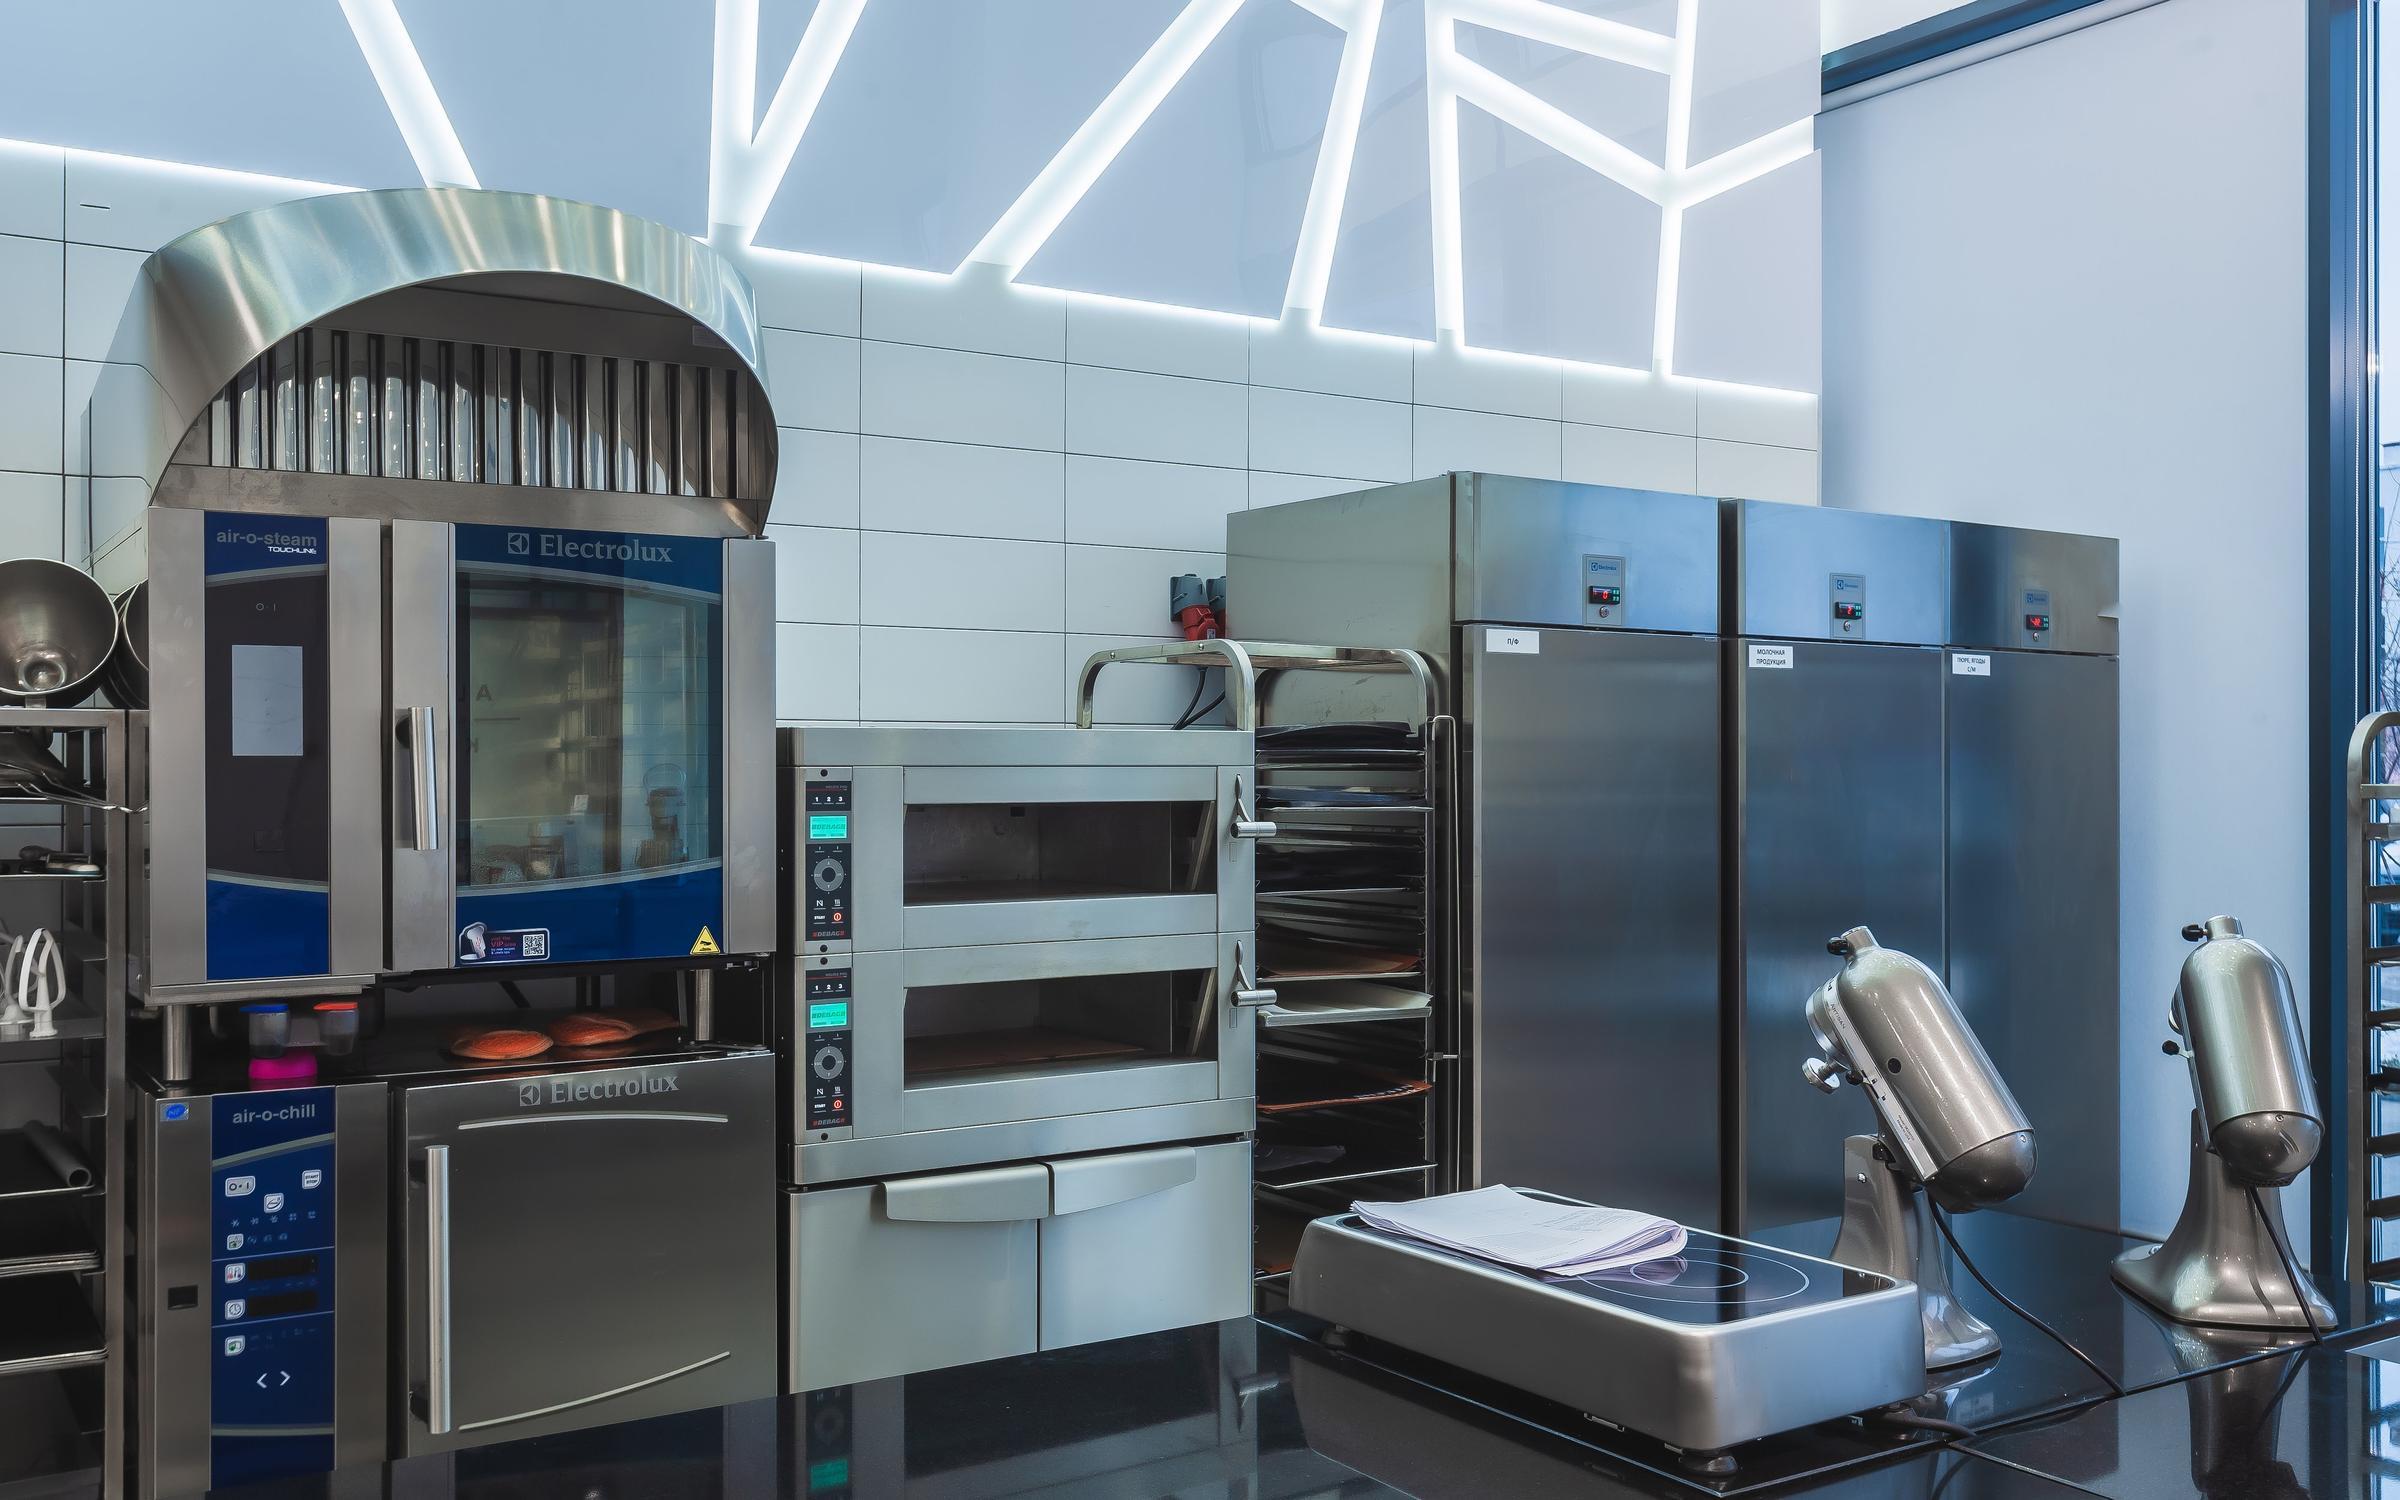 фотография Международной кулинарной школы Александра Кислицына VIP Masters на метро Ботанический сад